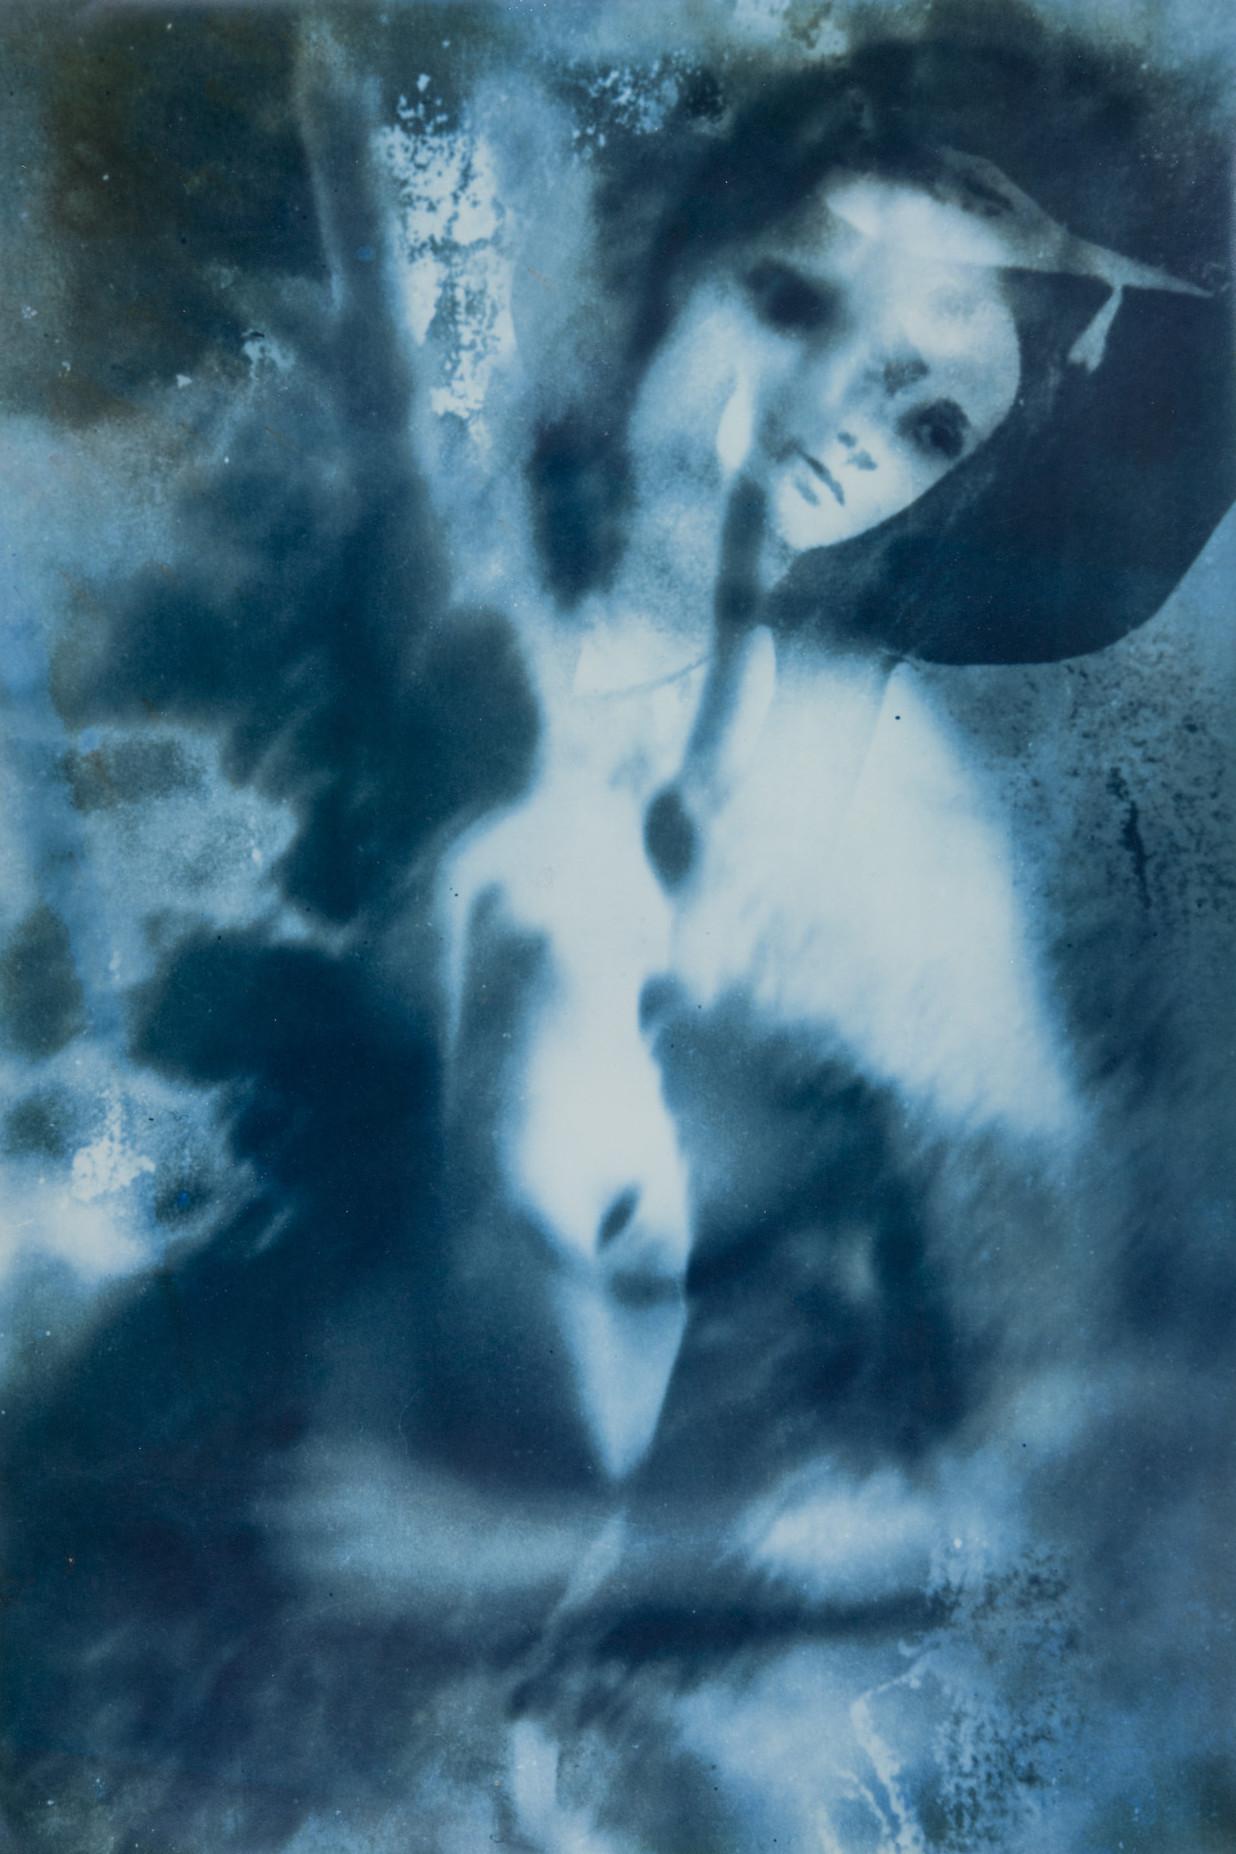 С. А. Фалин.  Из цикла «Соединение» 1992